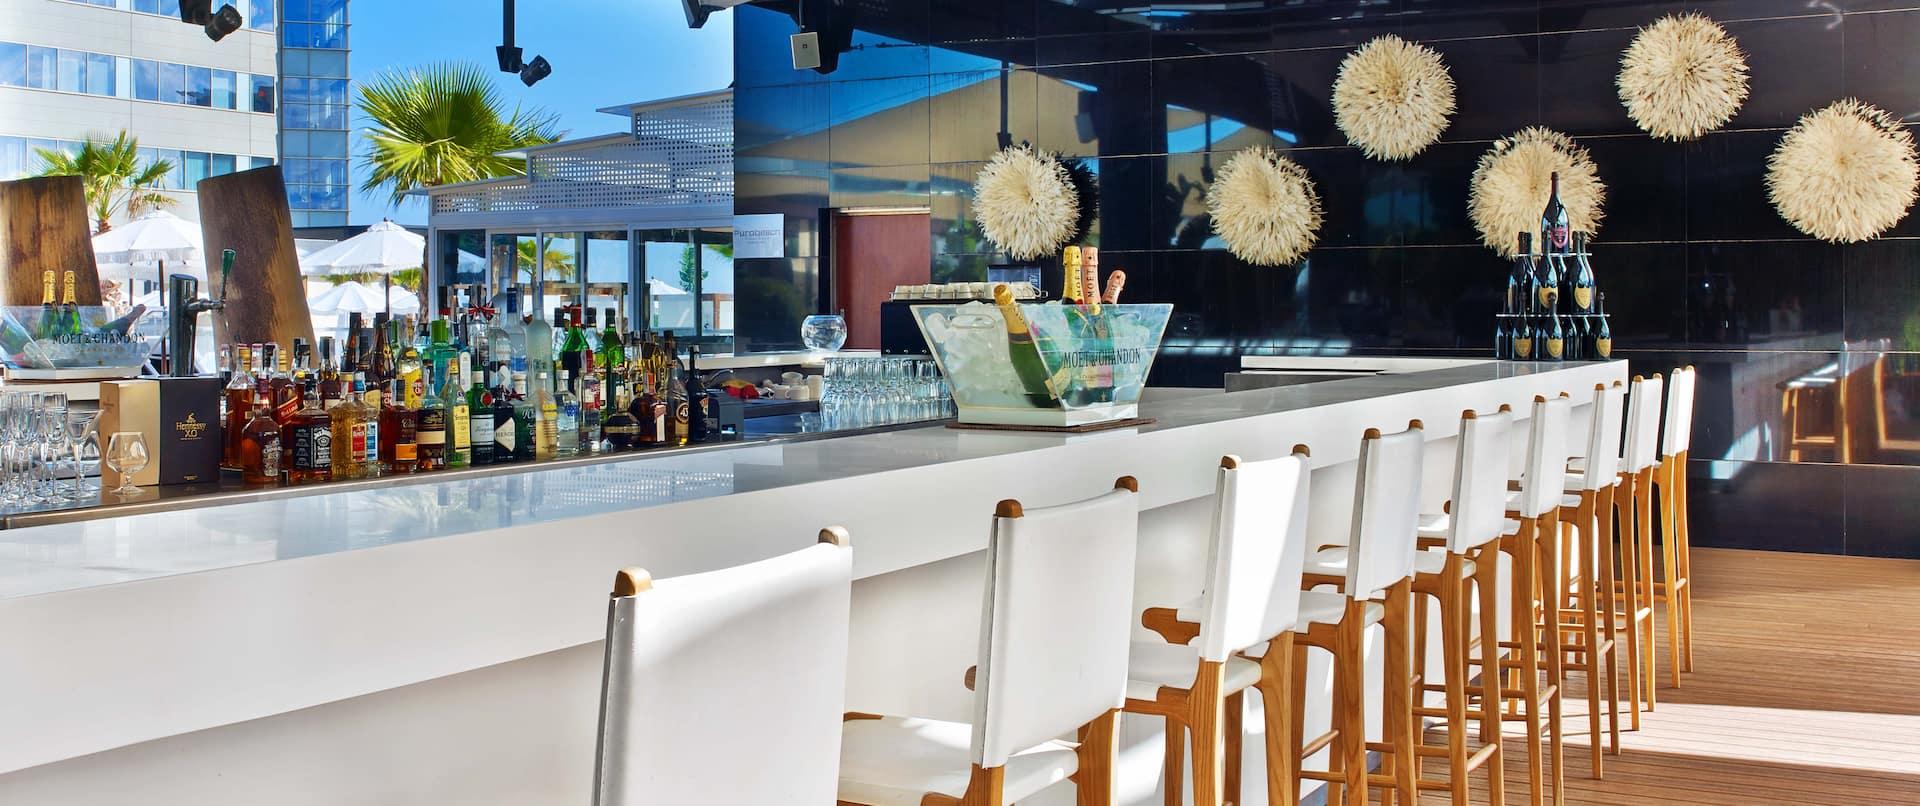 Rooftop Terrace Bar